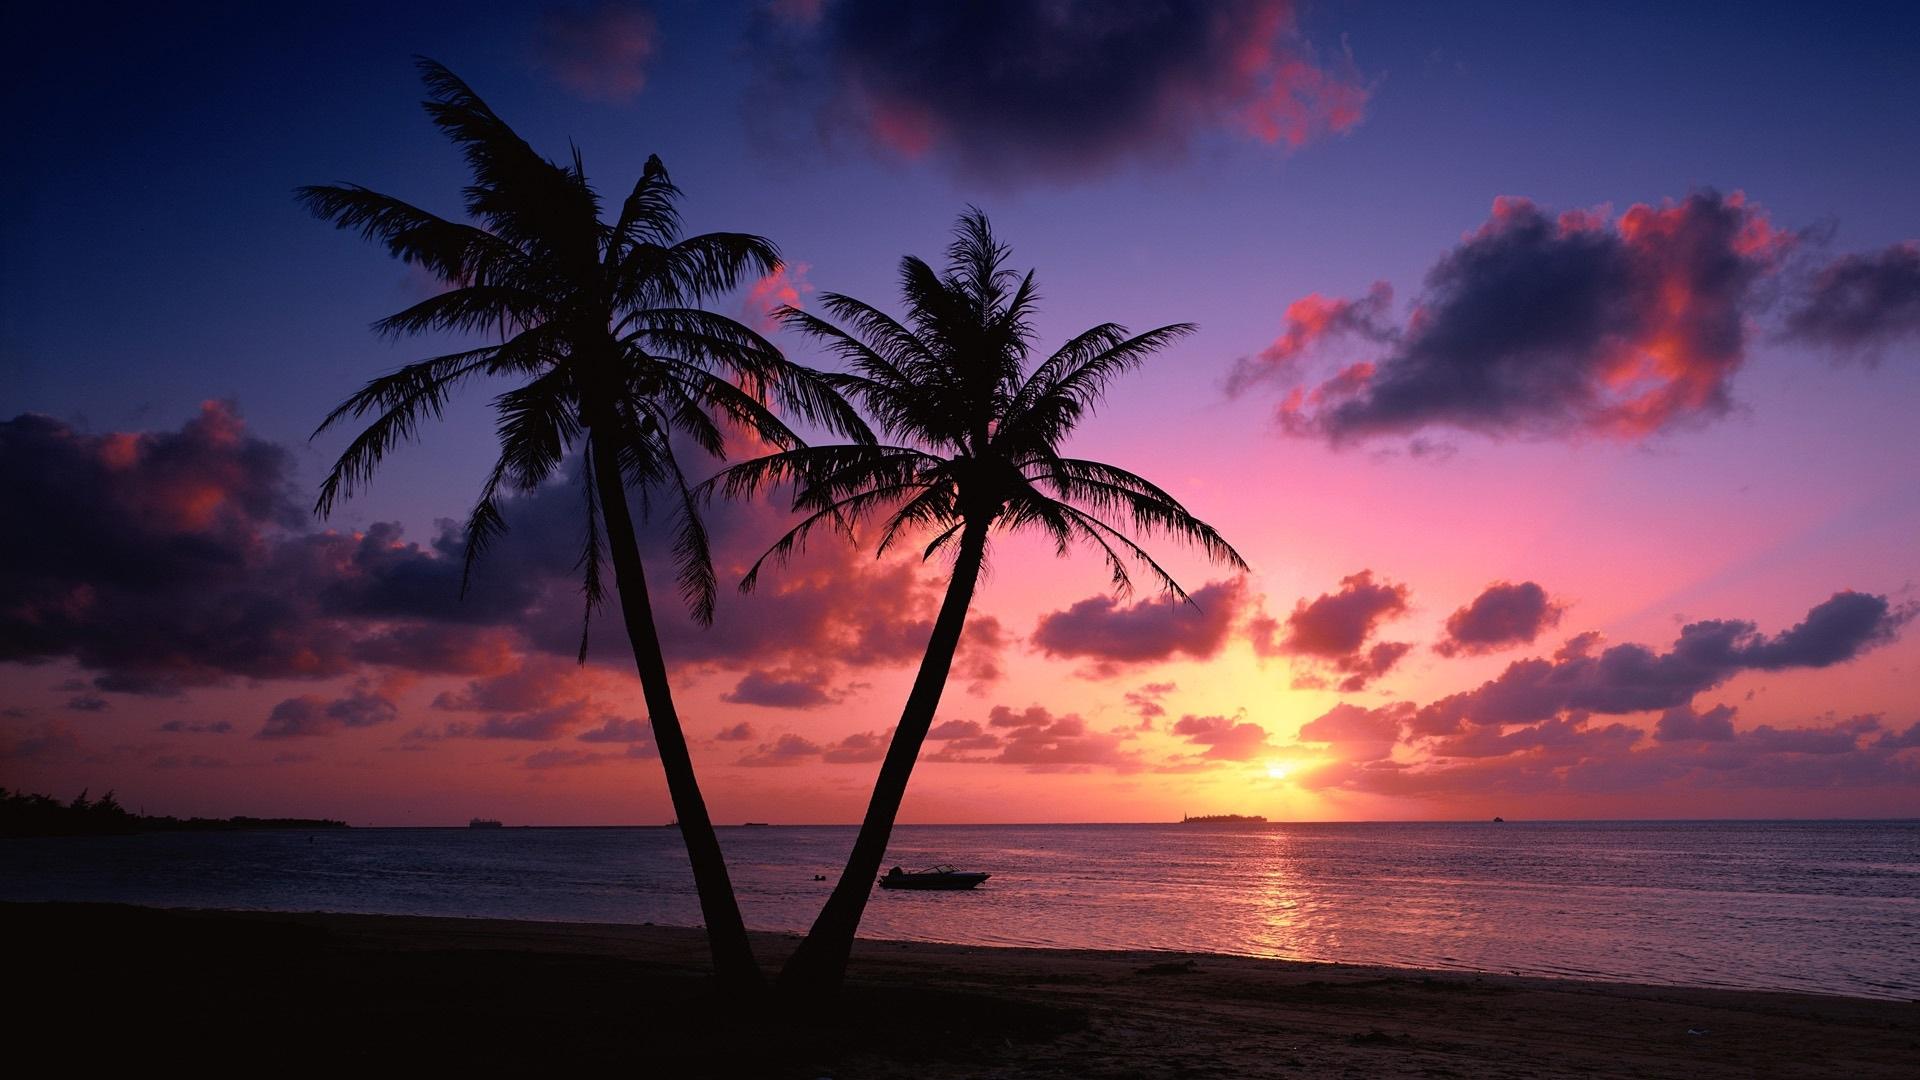 Sonnenuntergang Am Meer Mit Palmen